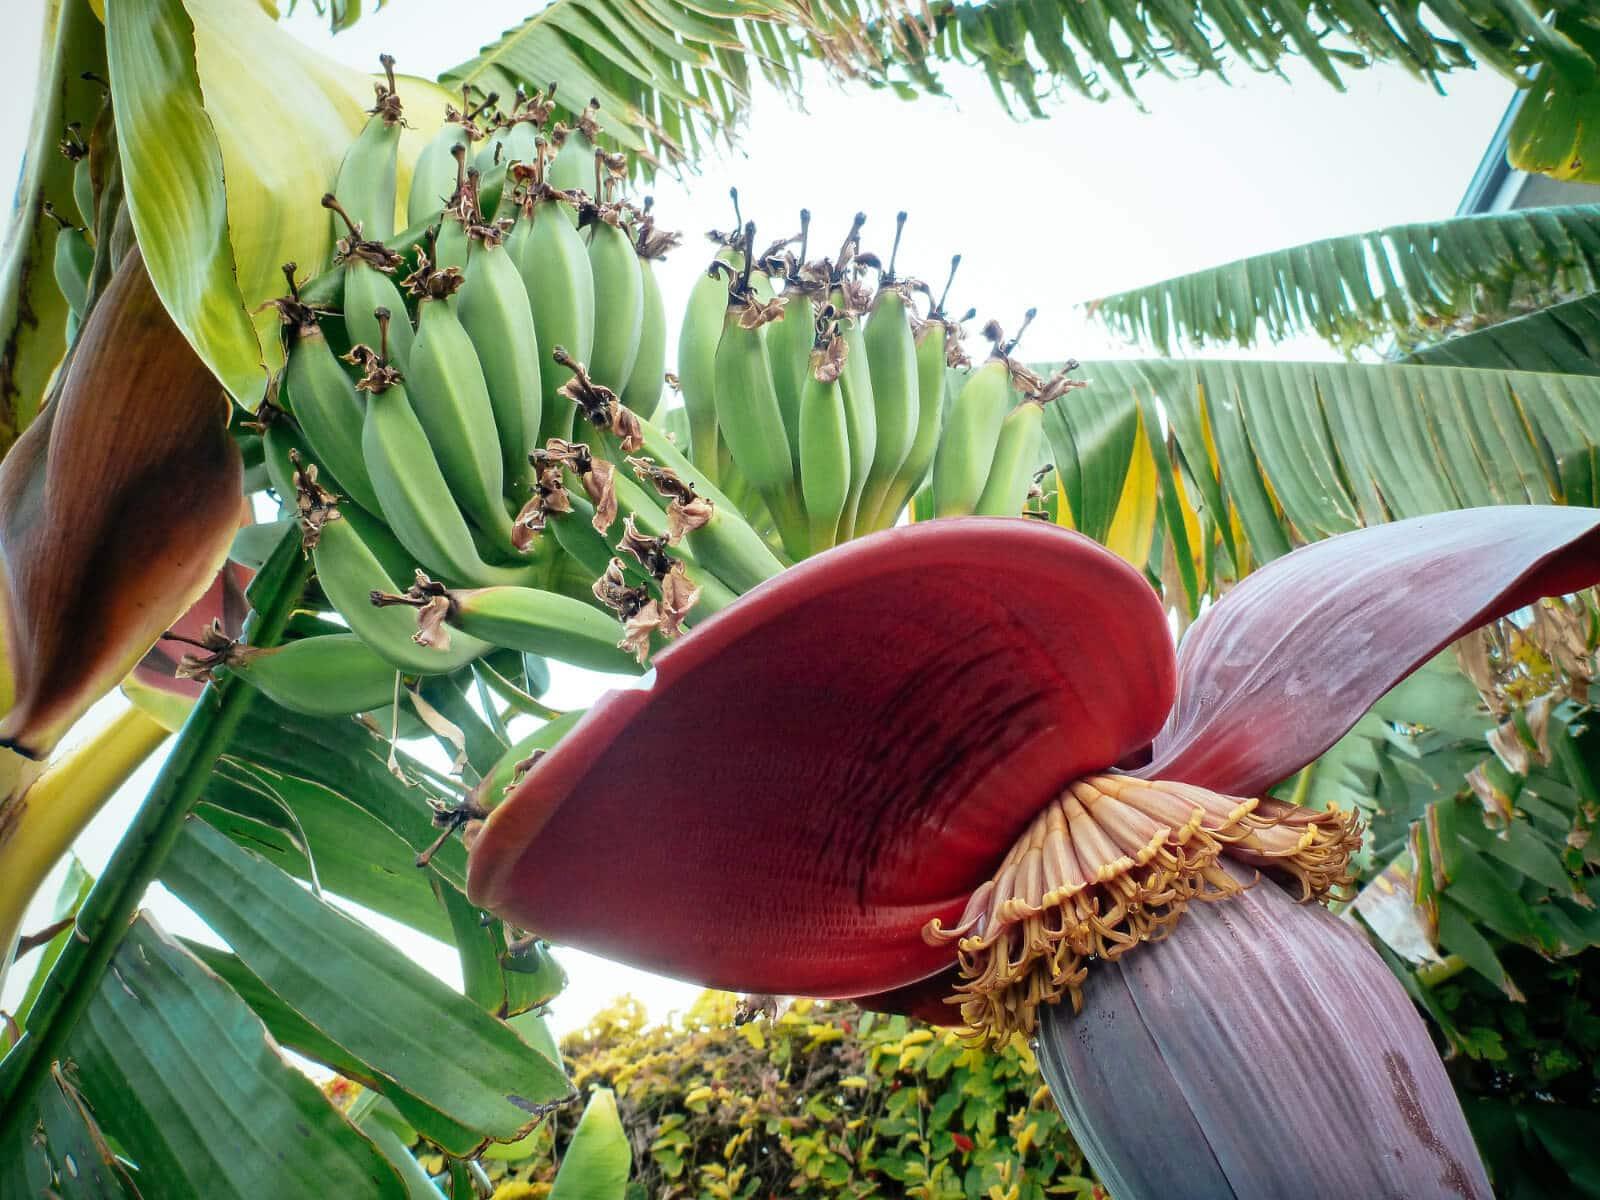 Immature banana fruit formed from female banana blossoms